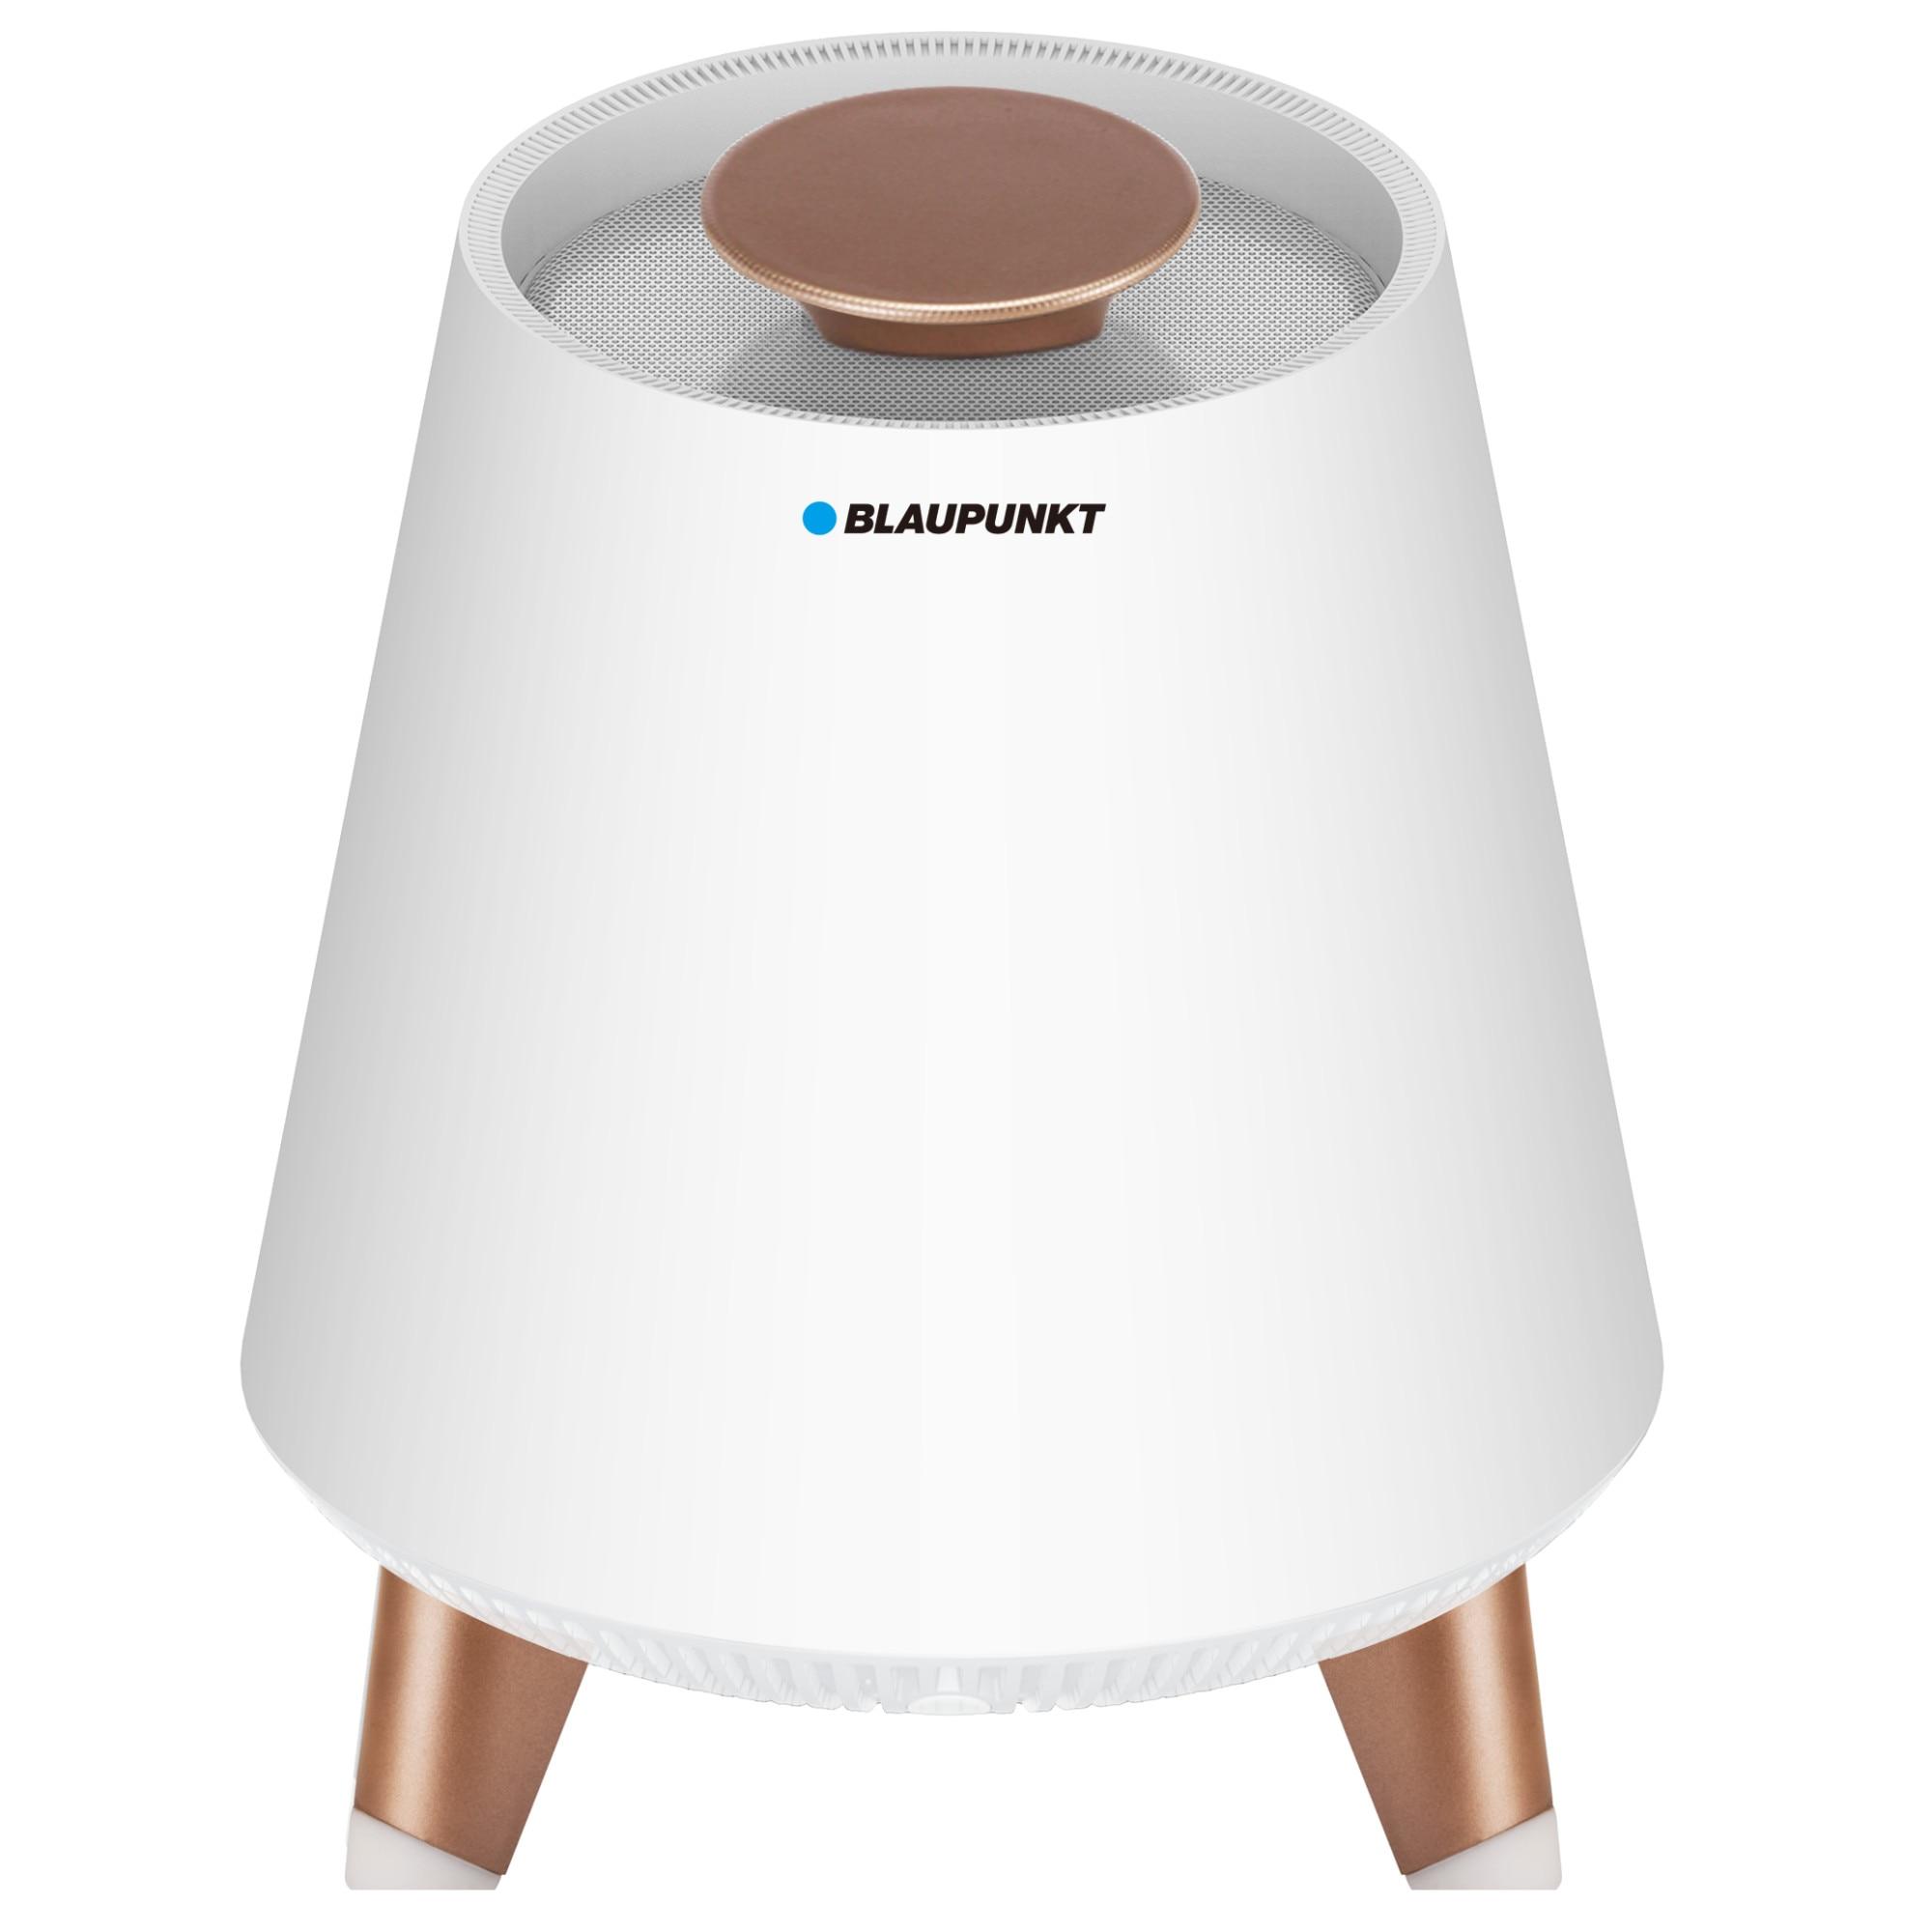 Fotografie Boxa portabila Blaupunkt BT25LAMP, USB, AUX, alarma , APP (iOS/Android),lumina